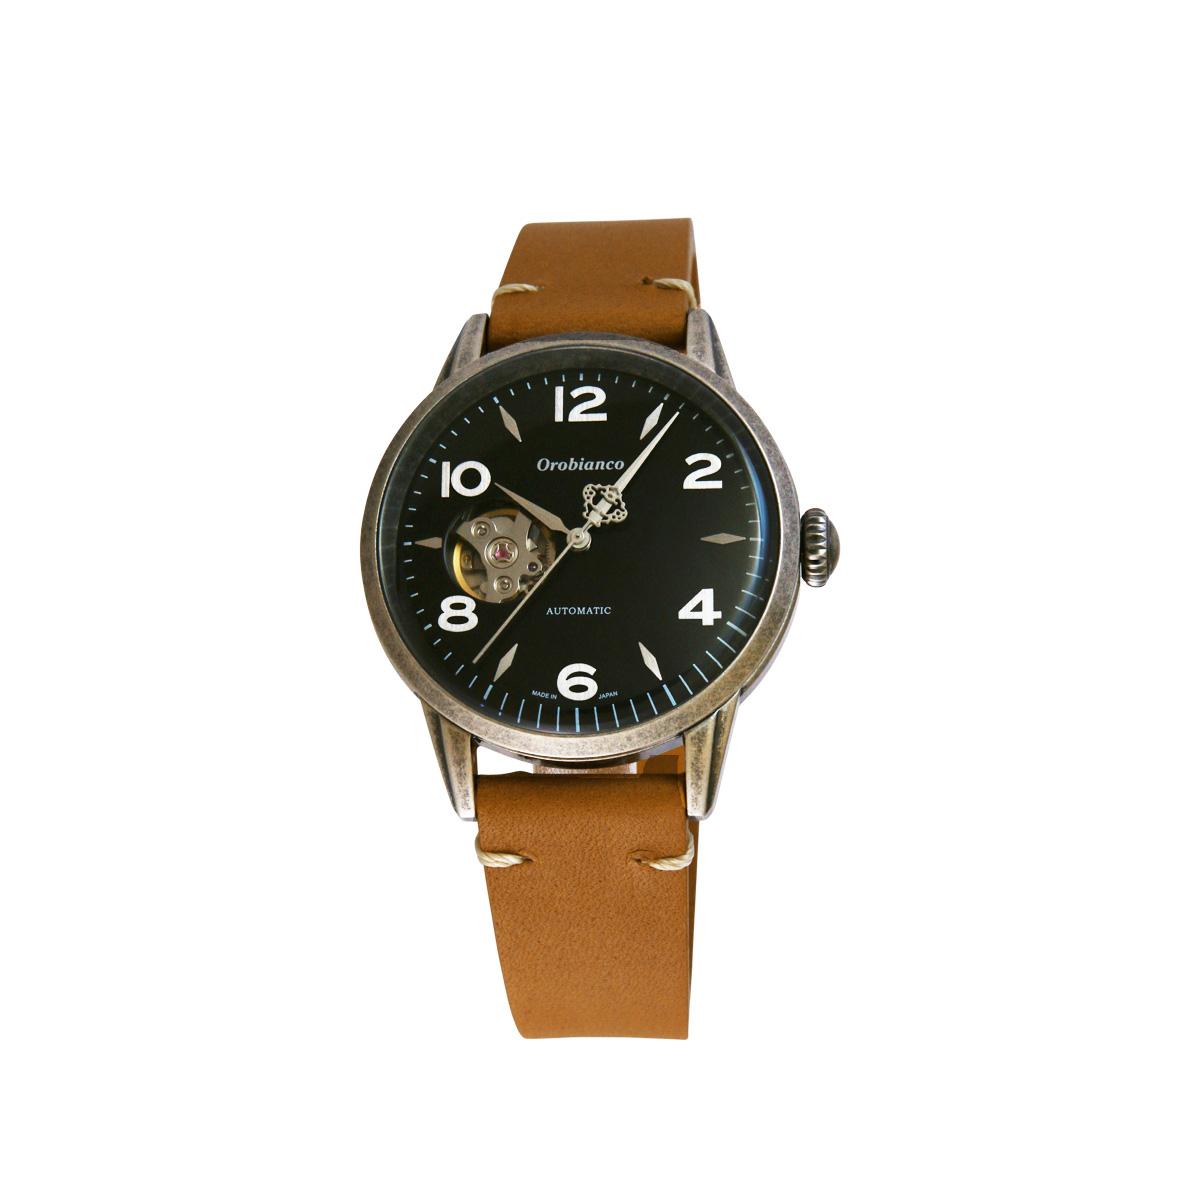 Orobianco EVOLUZIONE オロビアンコ 時計 腕時計 メンズ 自動巻き アナログ ブラック ブラウン キャメル OR0076 [5/7 追加入荷]